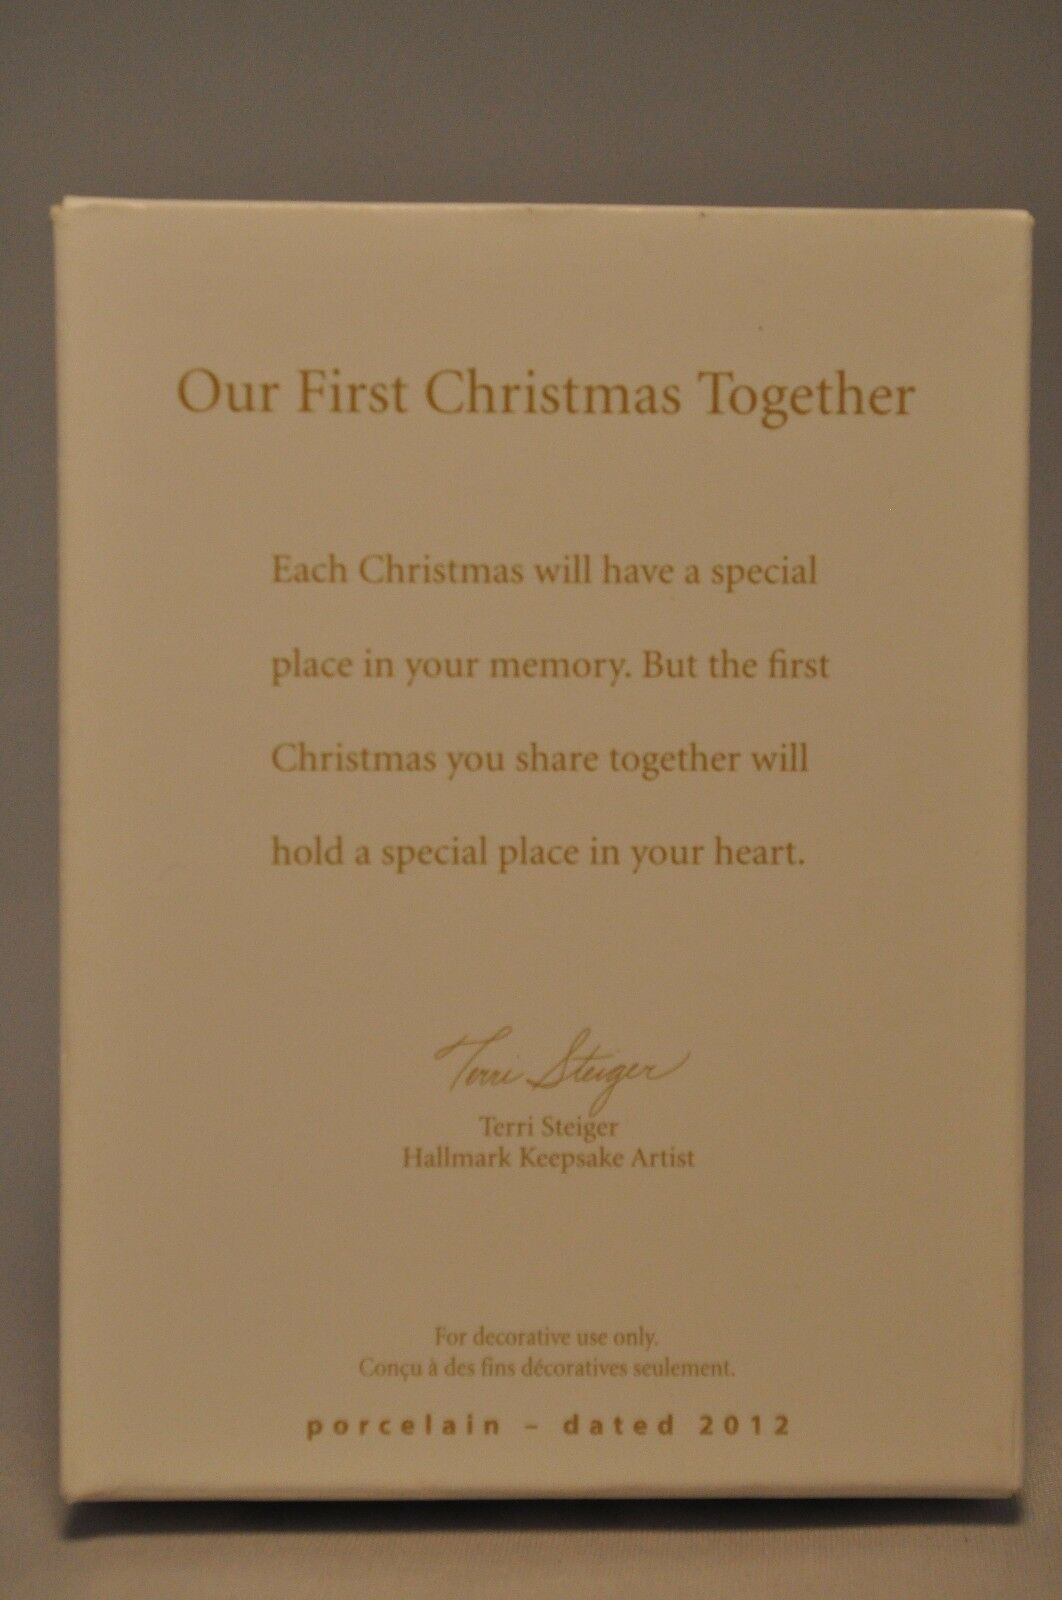 NIB 2012 HALLMARK CHRISTMAS ORNAMENT OUR FIRST CHRISTMAS TOGETHER PORCELAIN NEW